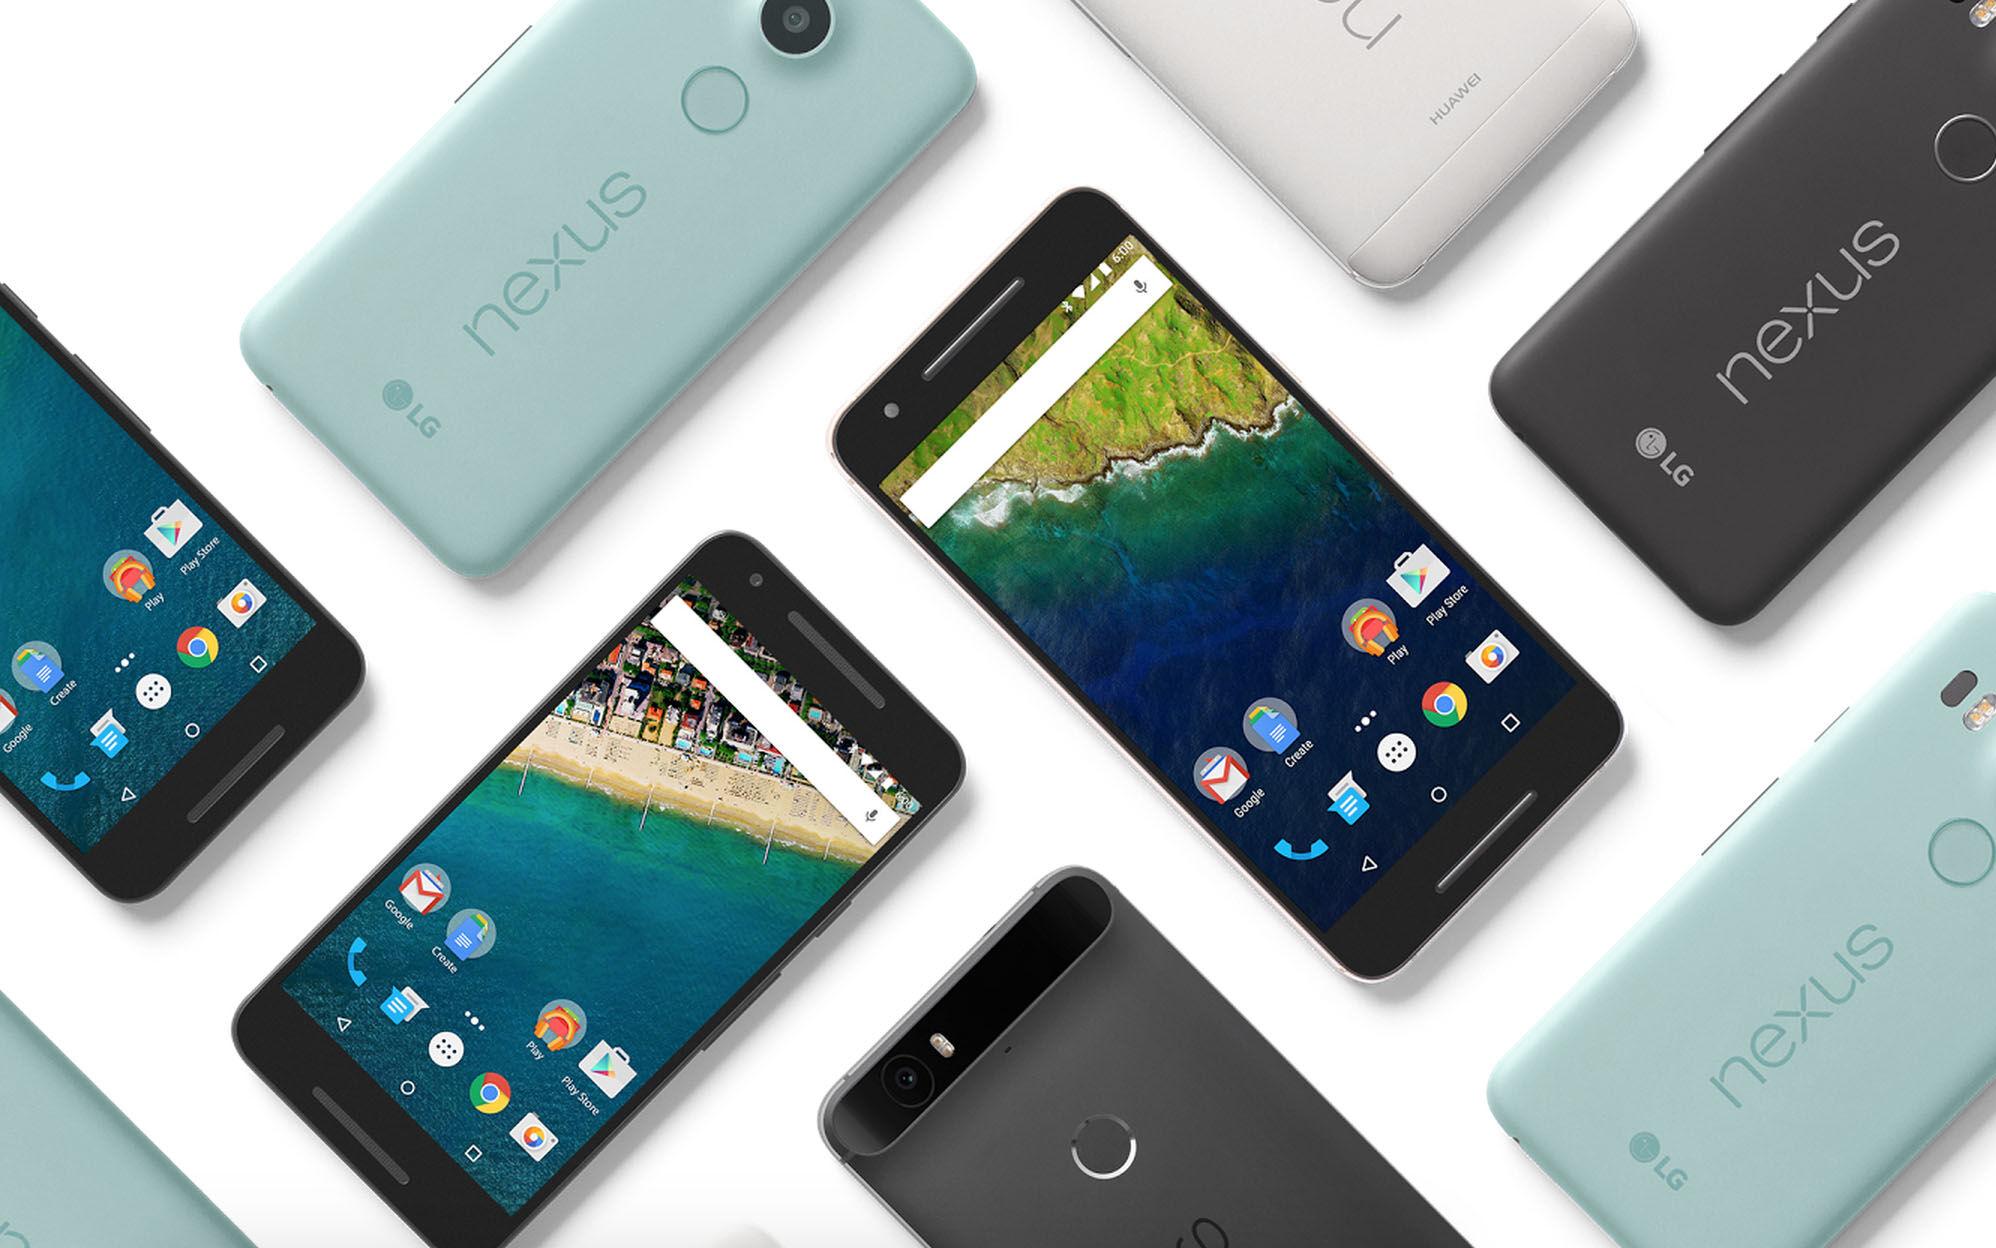 Evolusi Smartphone Google Nexus Pixel 3